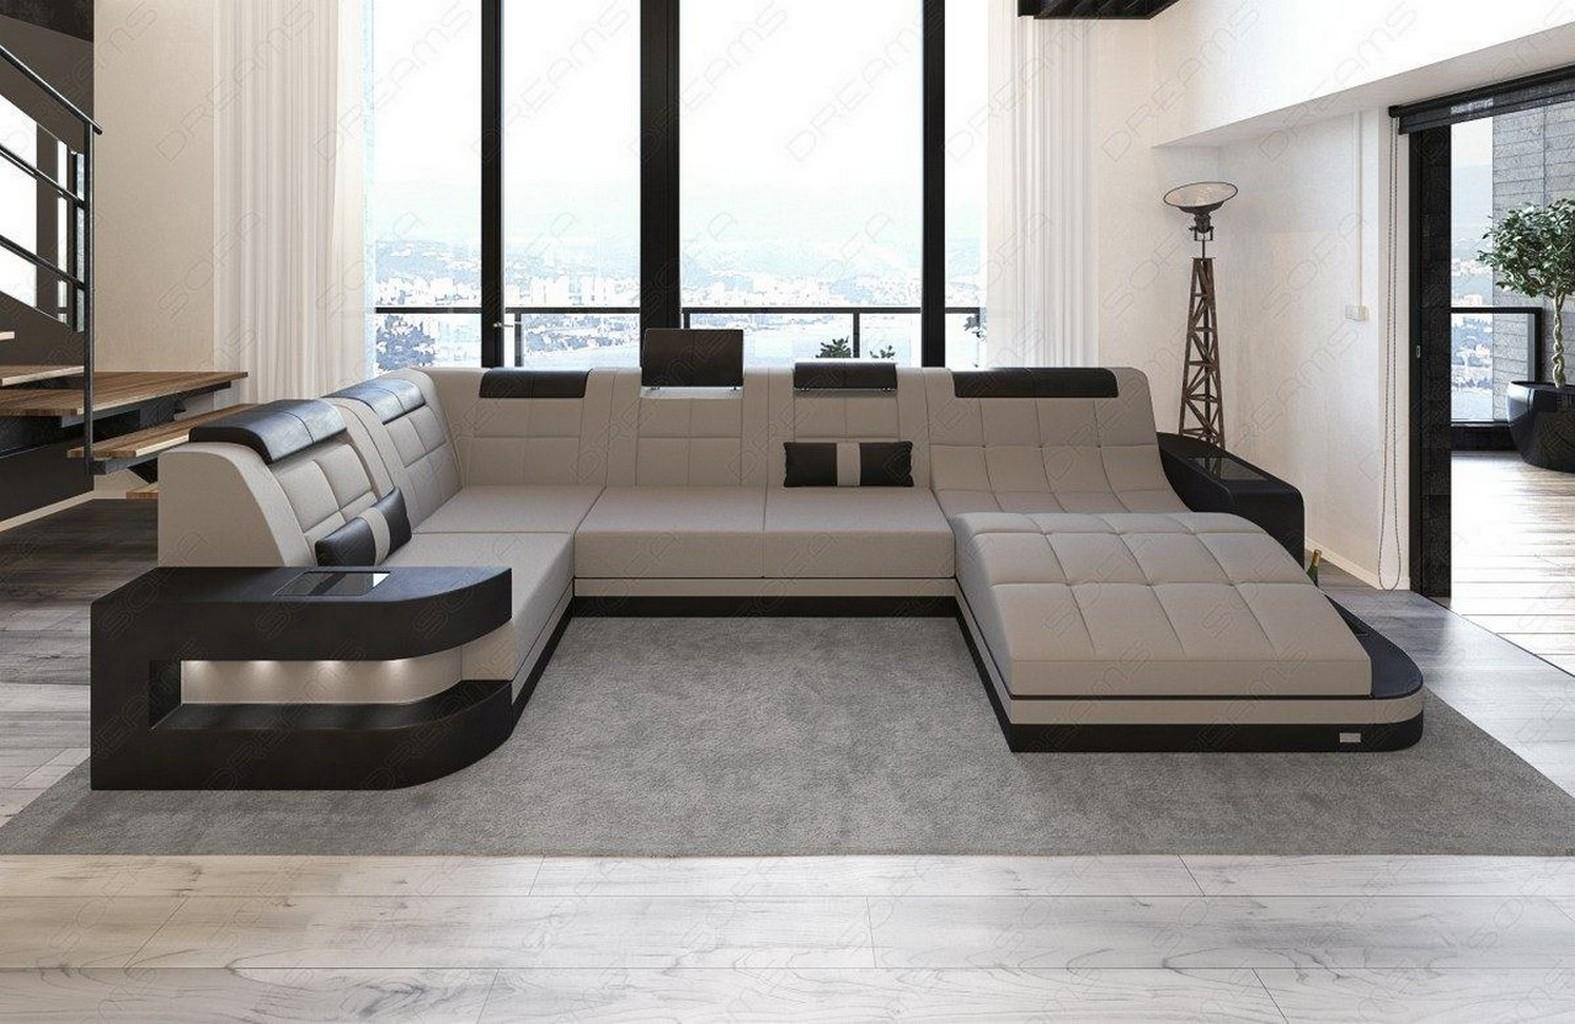 fabric sofa interior design wave u shape grey led lighting materialmix ebay. Black Bedroom Furniture Sets. Home Design Ideas